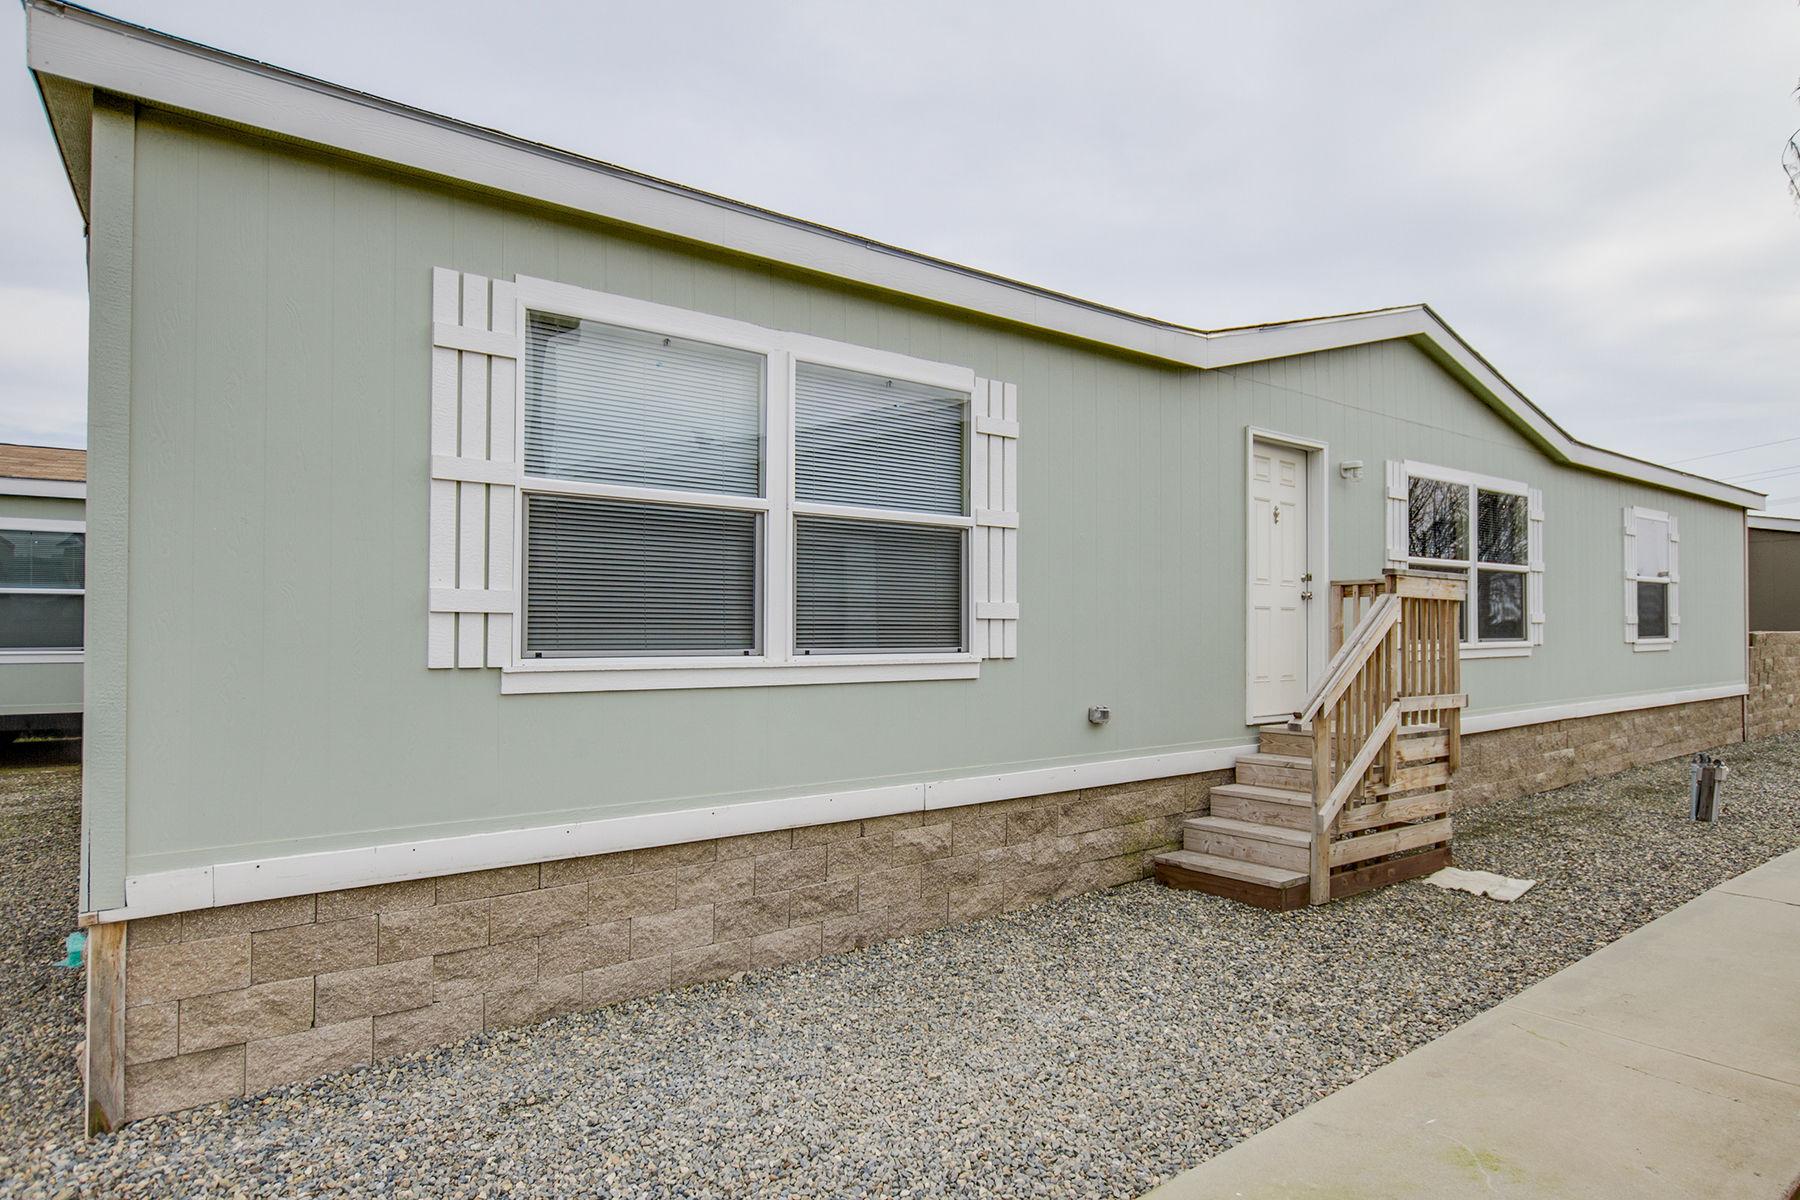 Best Kitchen Gallery: Merced California Homes Direct of New Mobile Home Models In California on rachelxblog.com